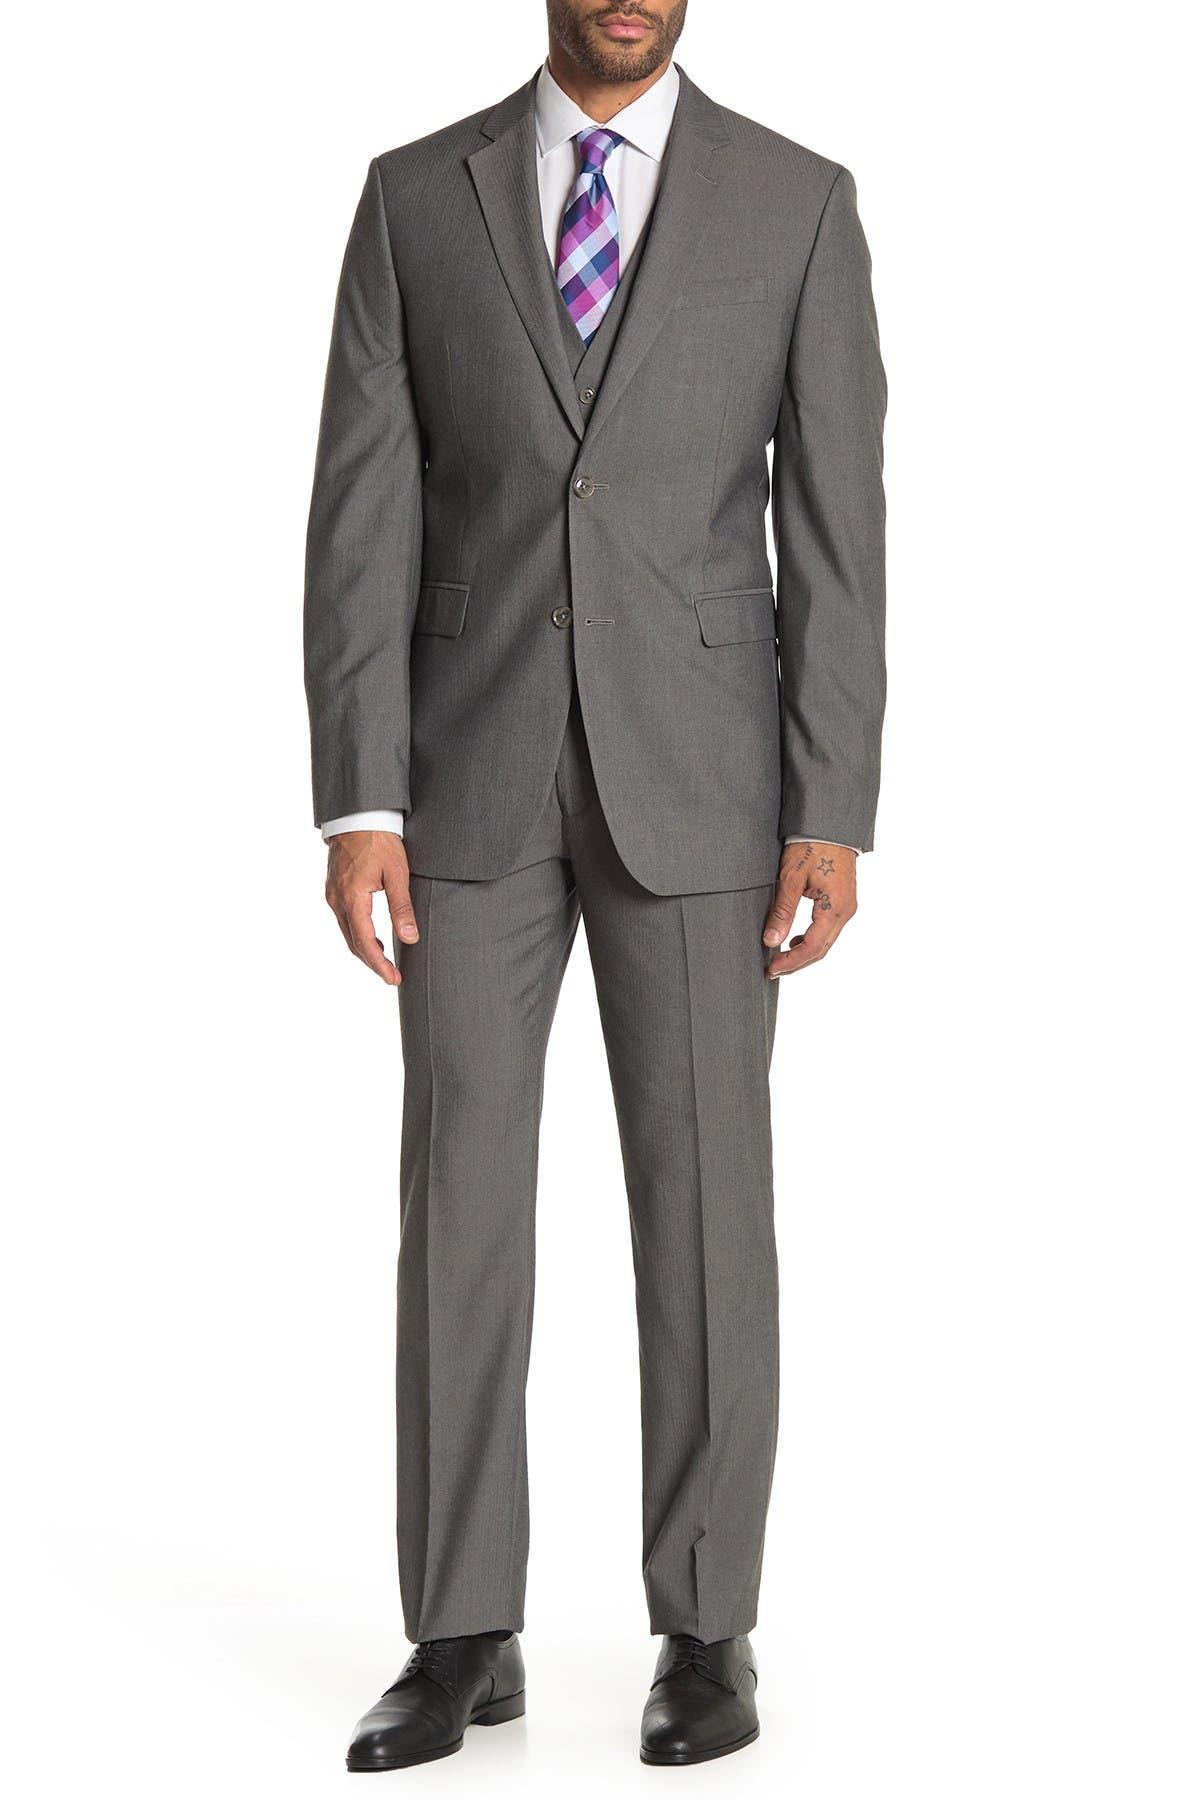 Image of Perry Ellis Grey Herringbone Two-Button Notch Lapel Slim Fit 3-Piece Suit